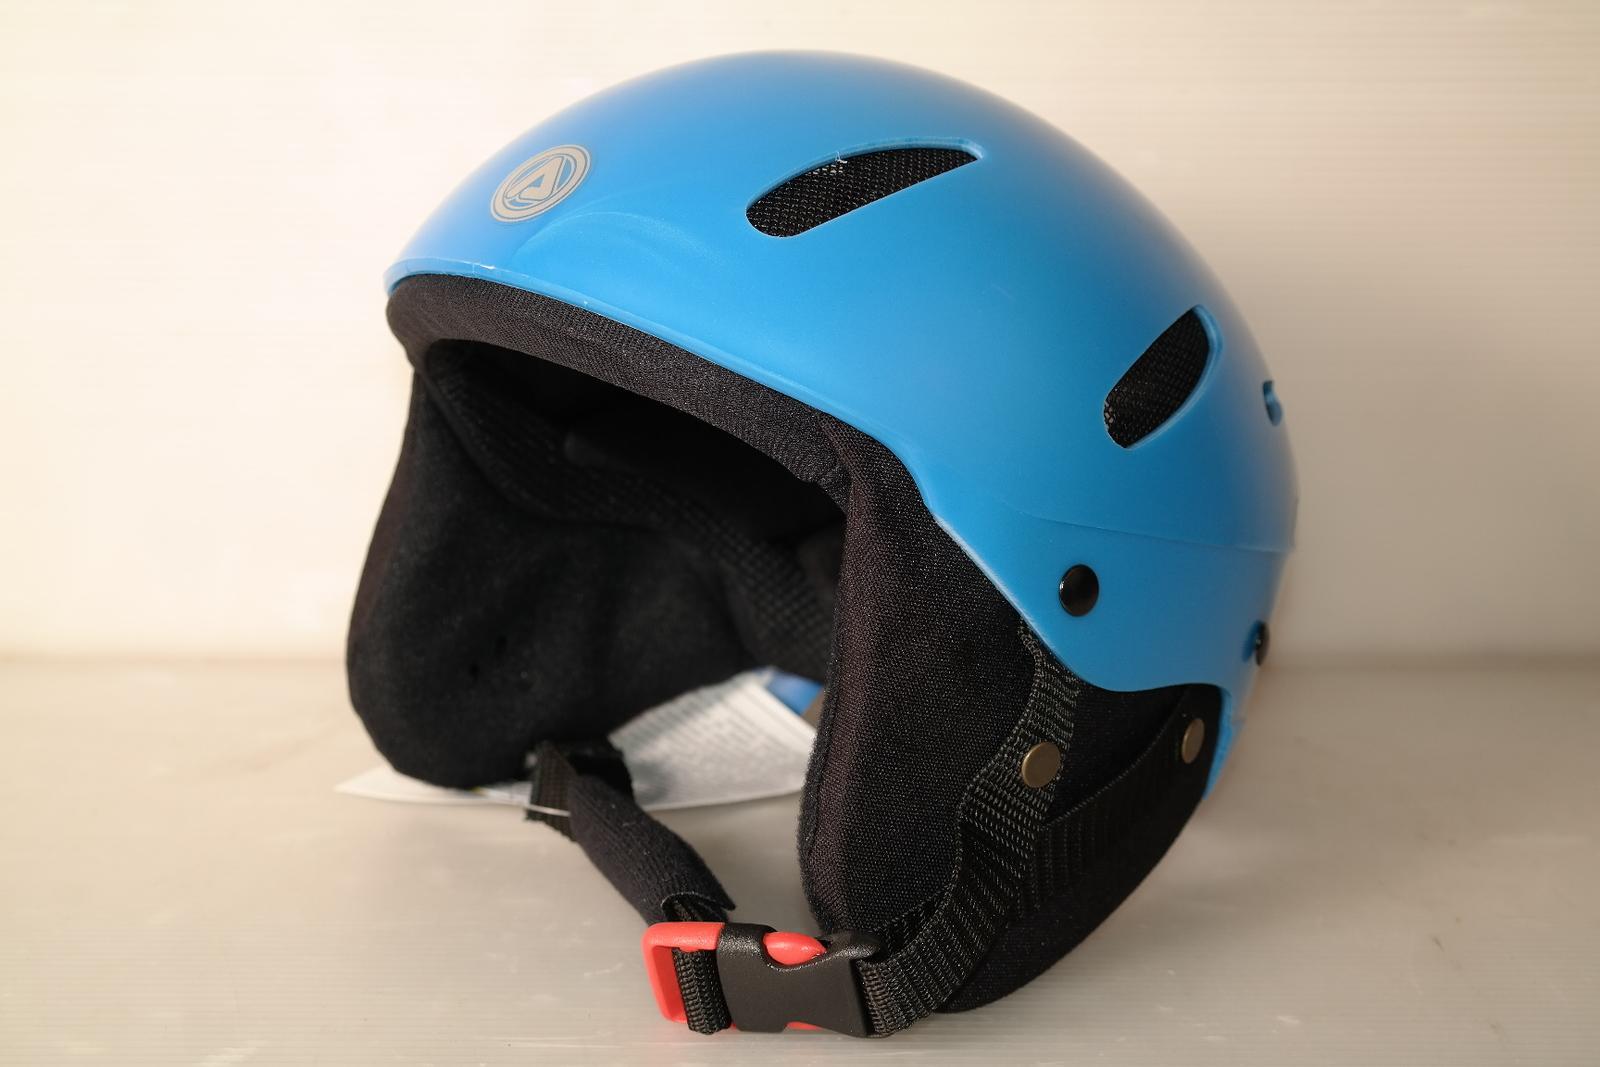 Dámská lyžařská helma Acerbis Azzurro vel. 62